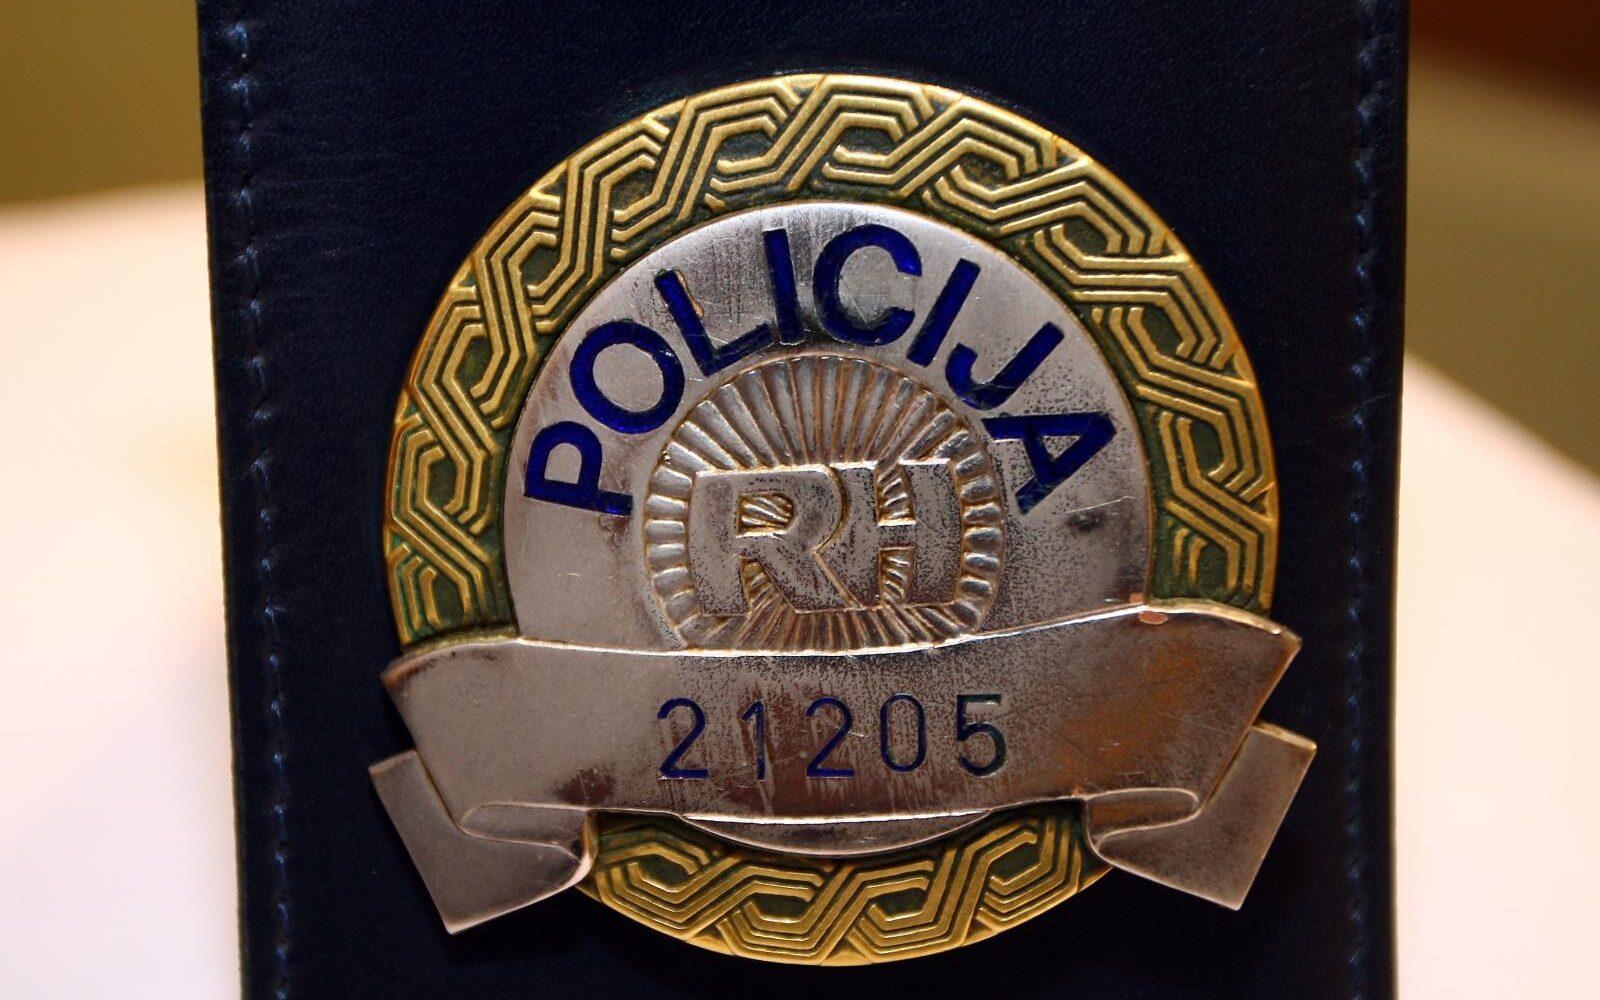 Policijska Uprava Zagrebacka Građanima Uputila Vazne Informacije Poslovni Dnevnik